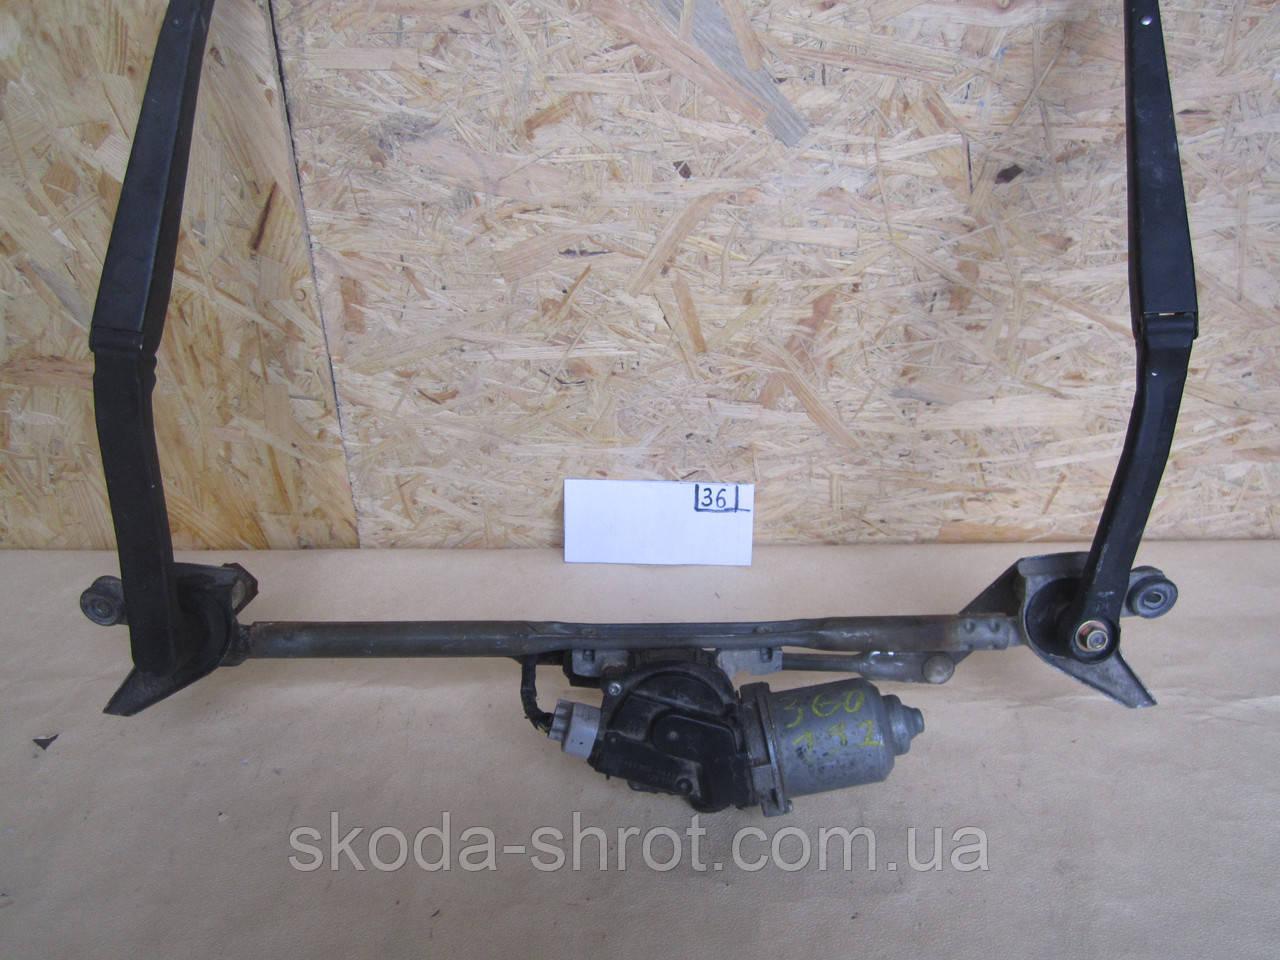 9E51-17566-AA Трапеция механизм моторчик стеклоочистителя Ford Fusion, 2010 г.